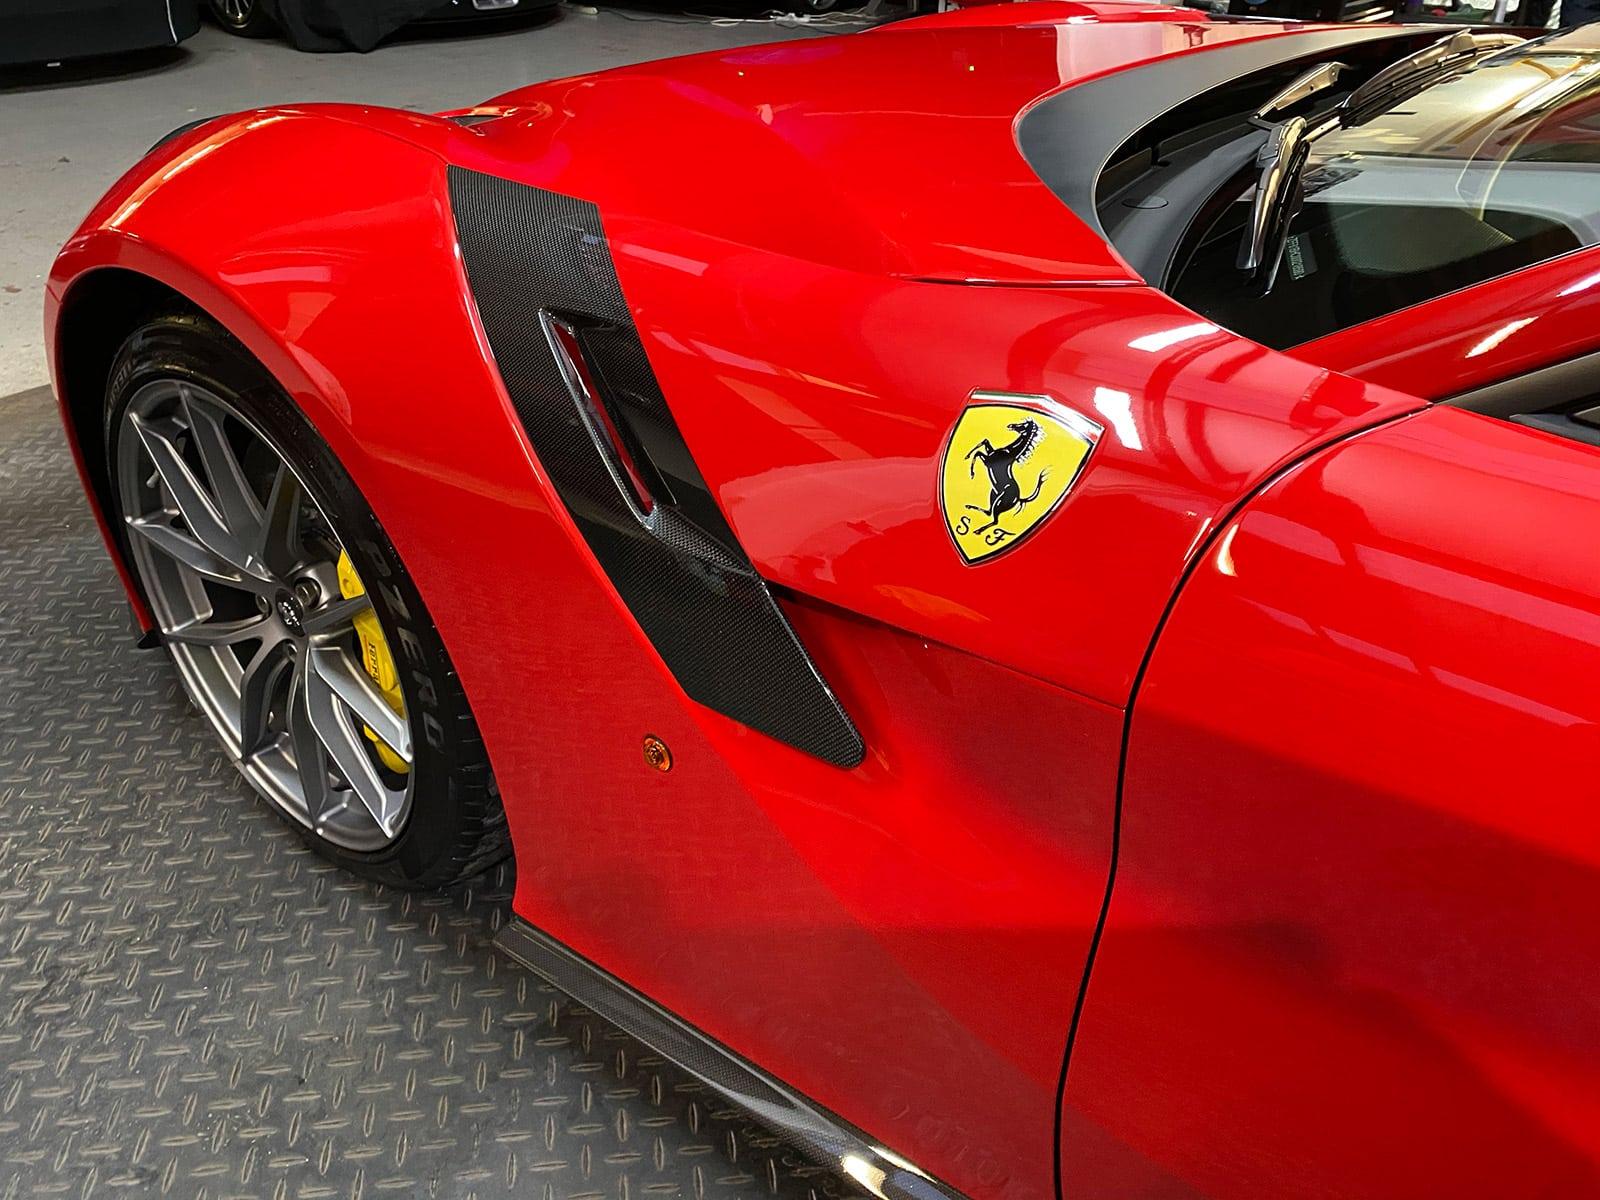 Ferrari F12 TDF hypercars detailing